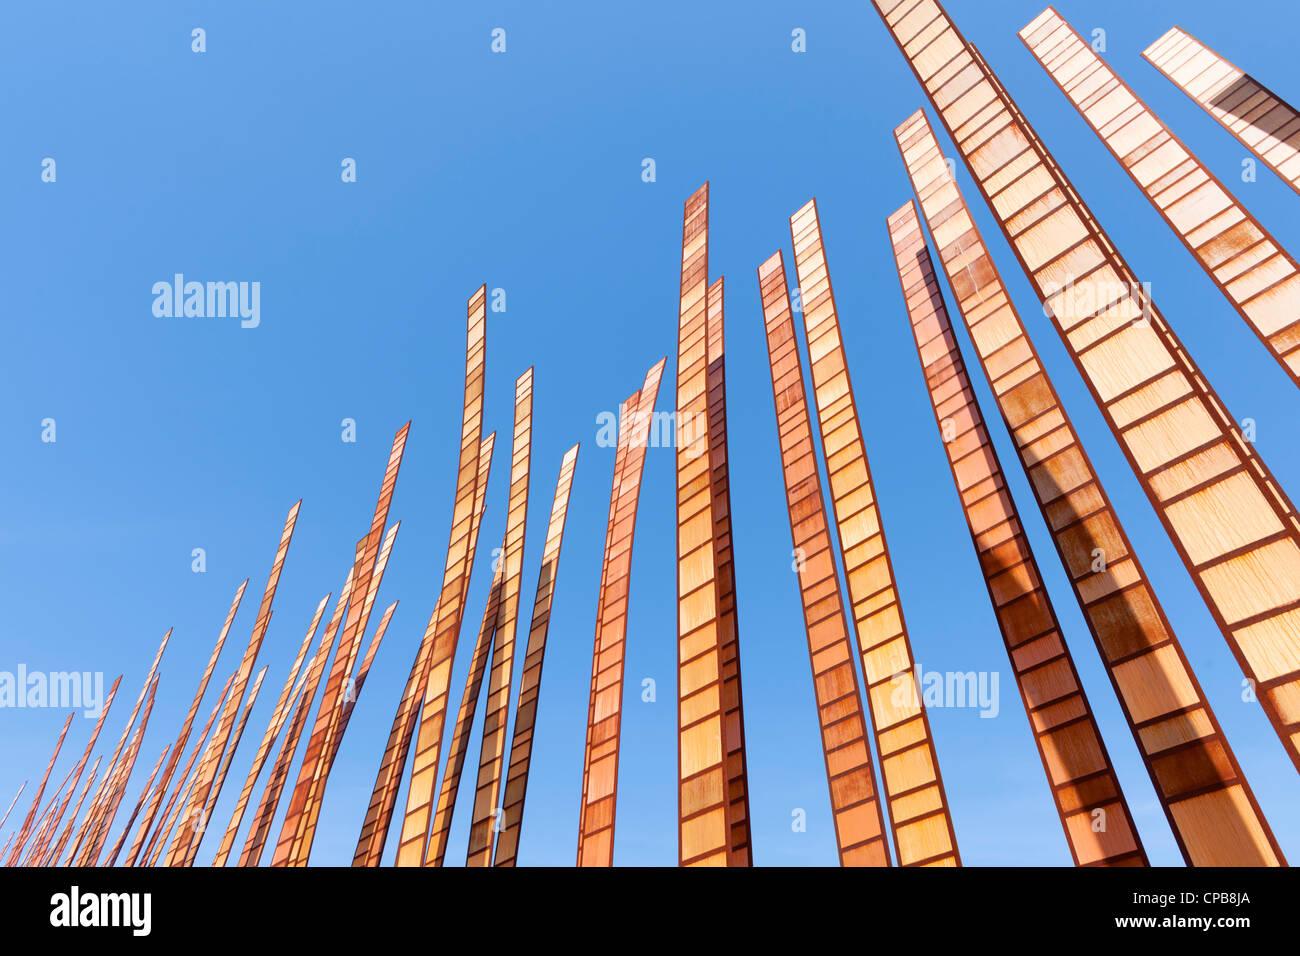 Grass Blades sculpture, Seattle Center - Stock Image